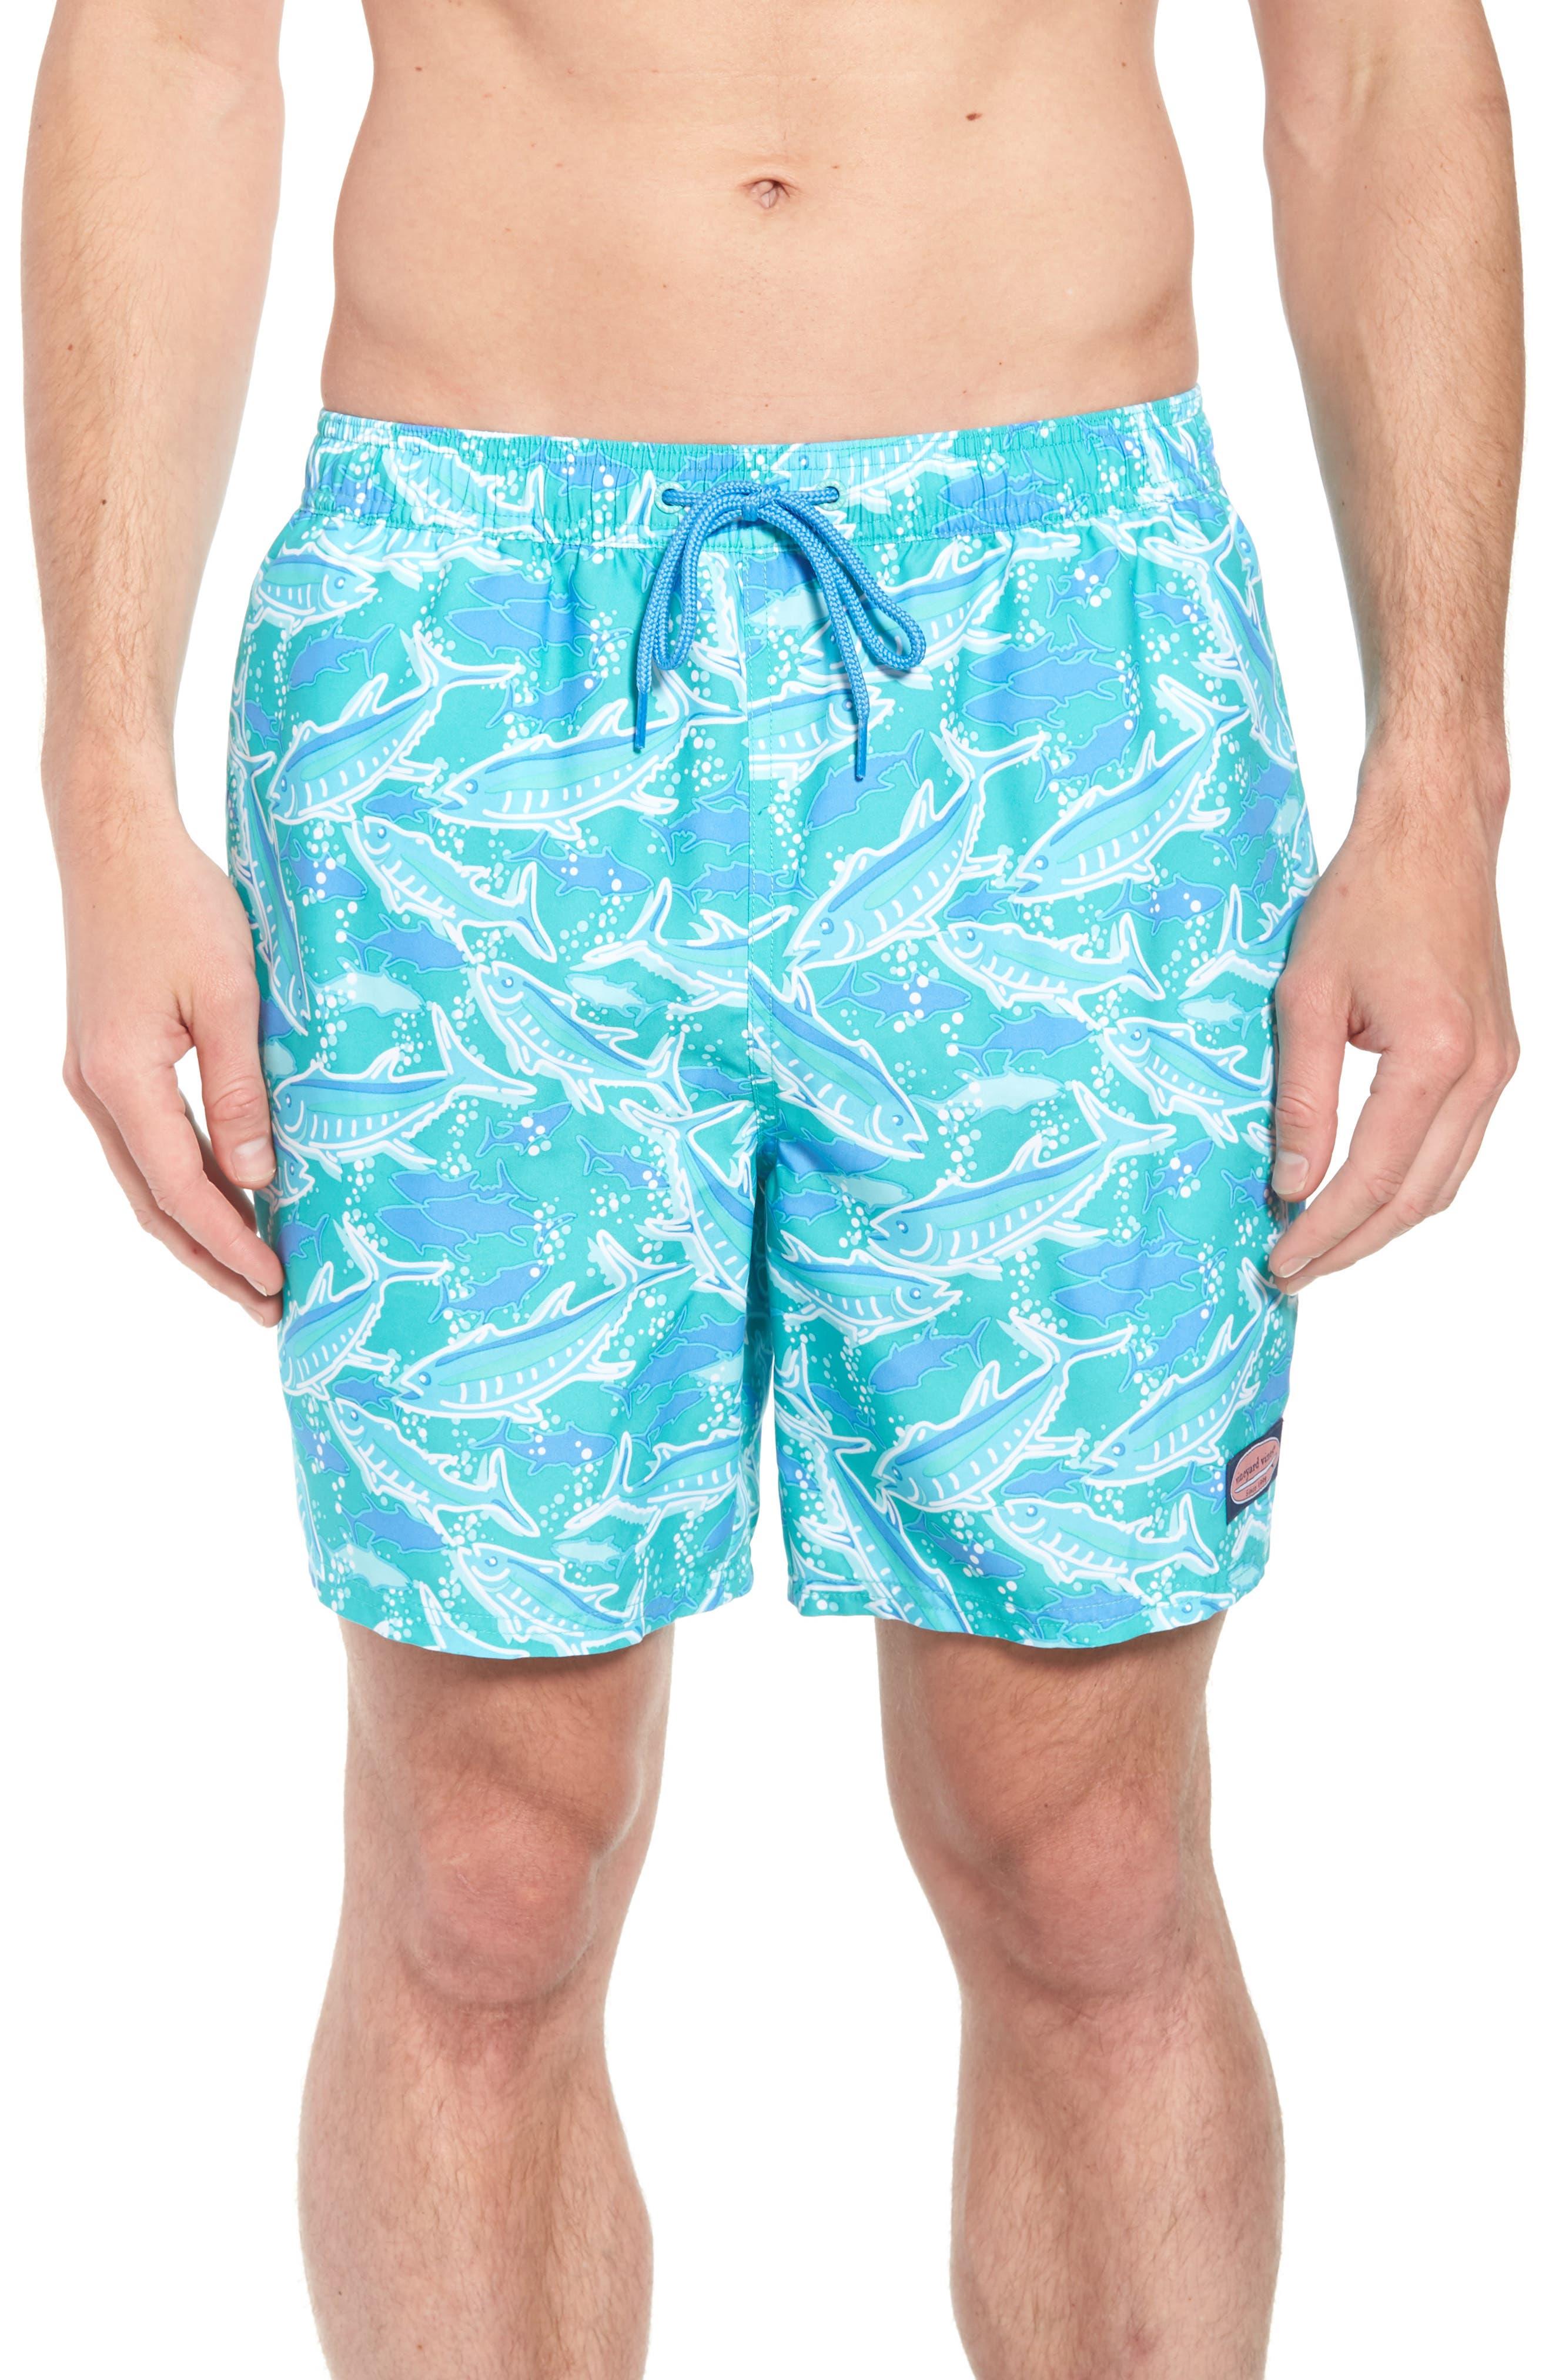 VINEYARD VINES Chappy School of Tuna Swim Trunks, Main, color, 356